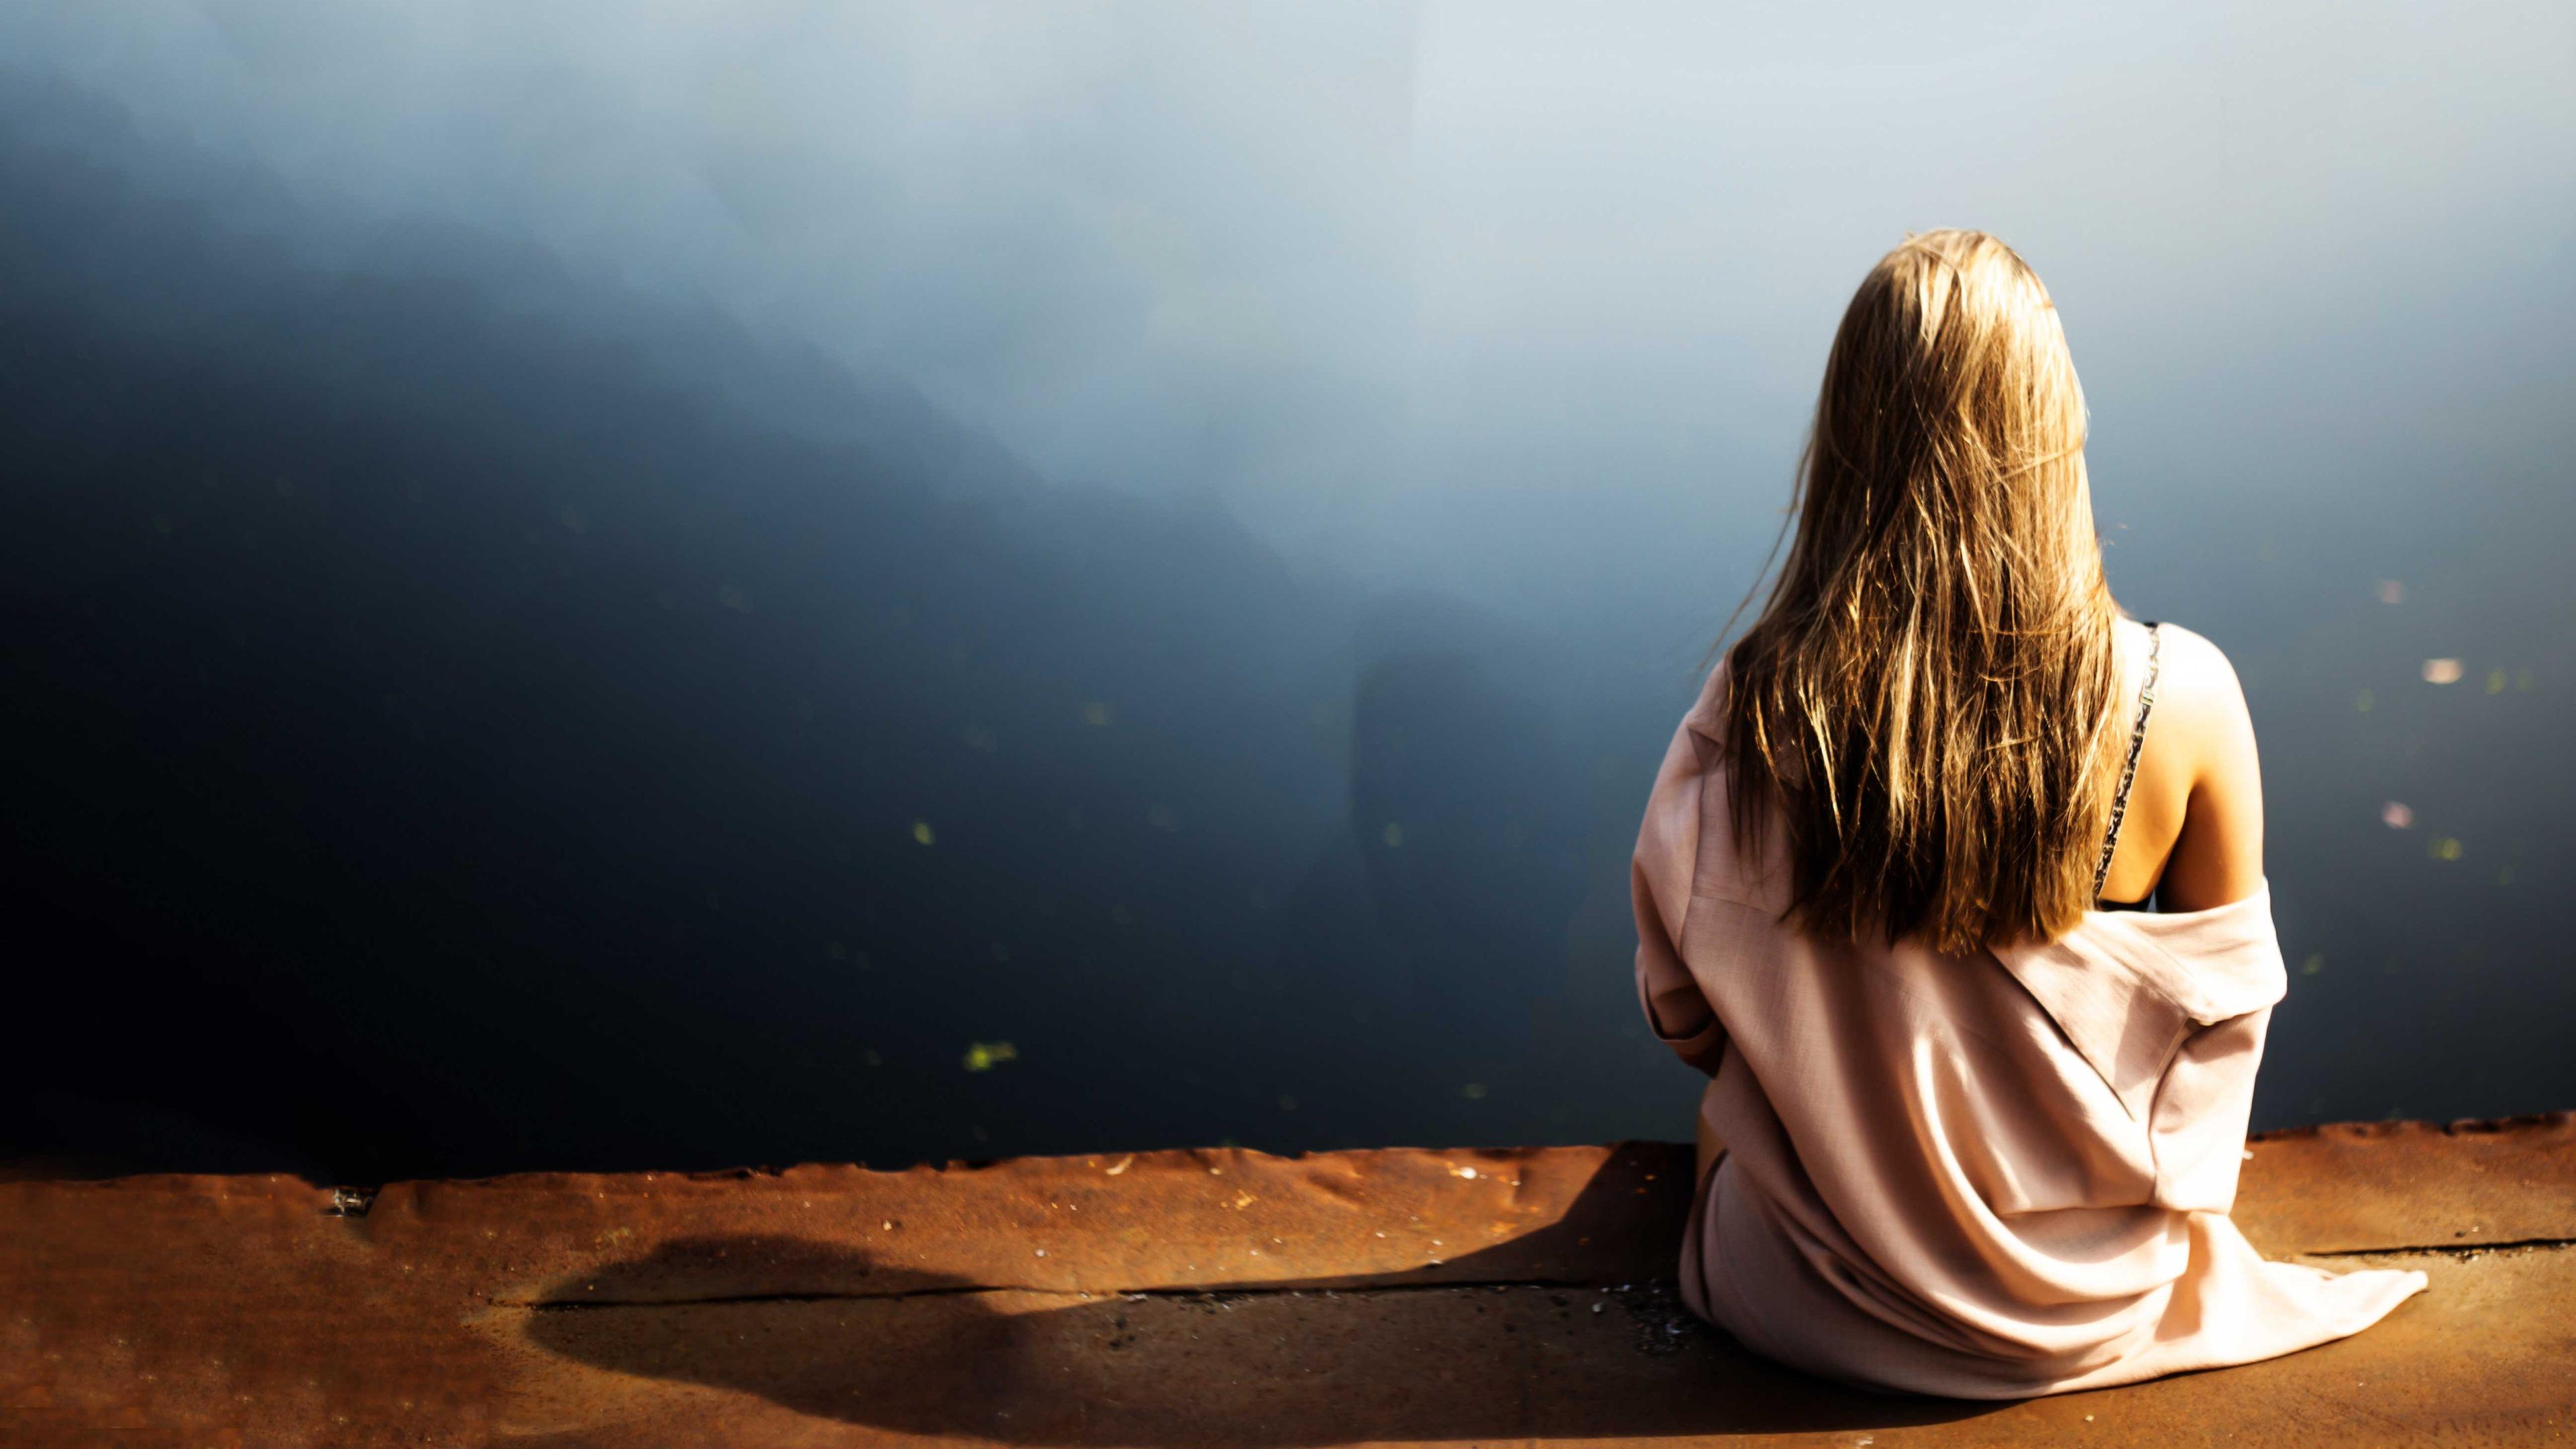 Alone Sad Girl Hq Desktop Wallpaper - Life Sad Status For Girls - HD Wallpaper